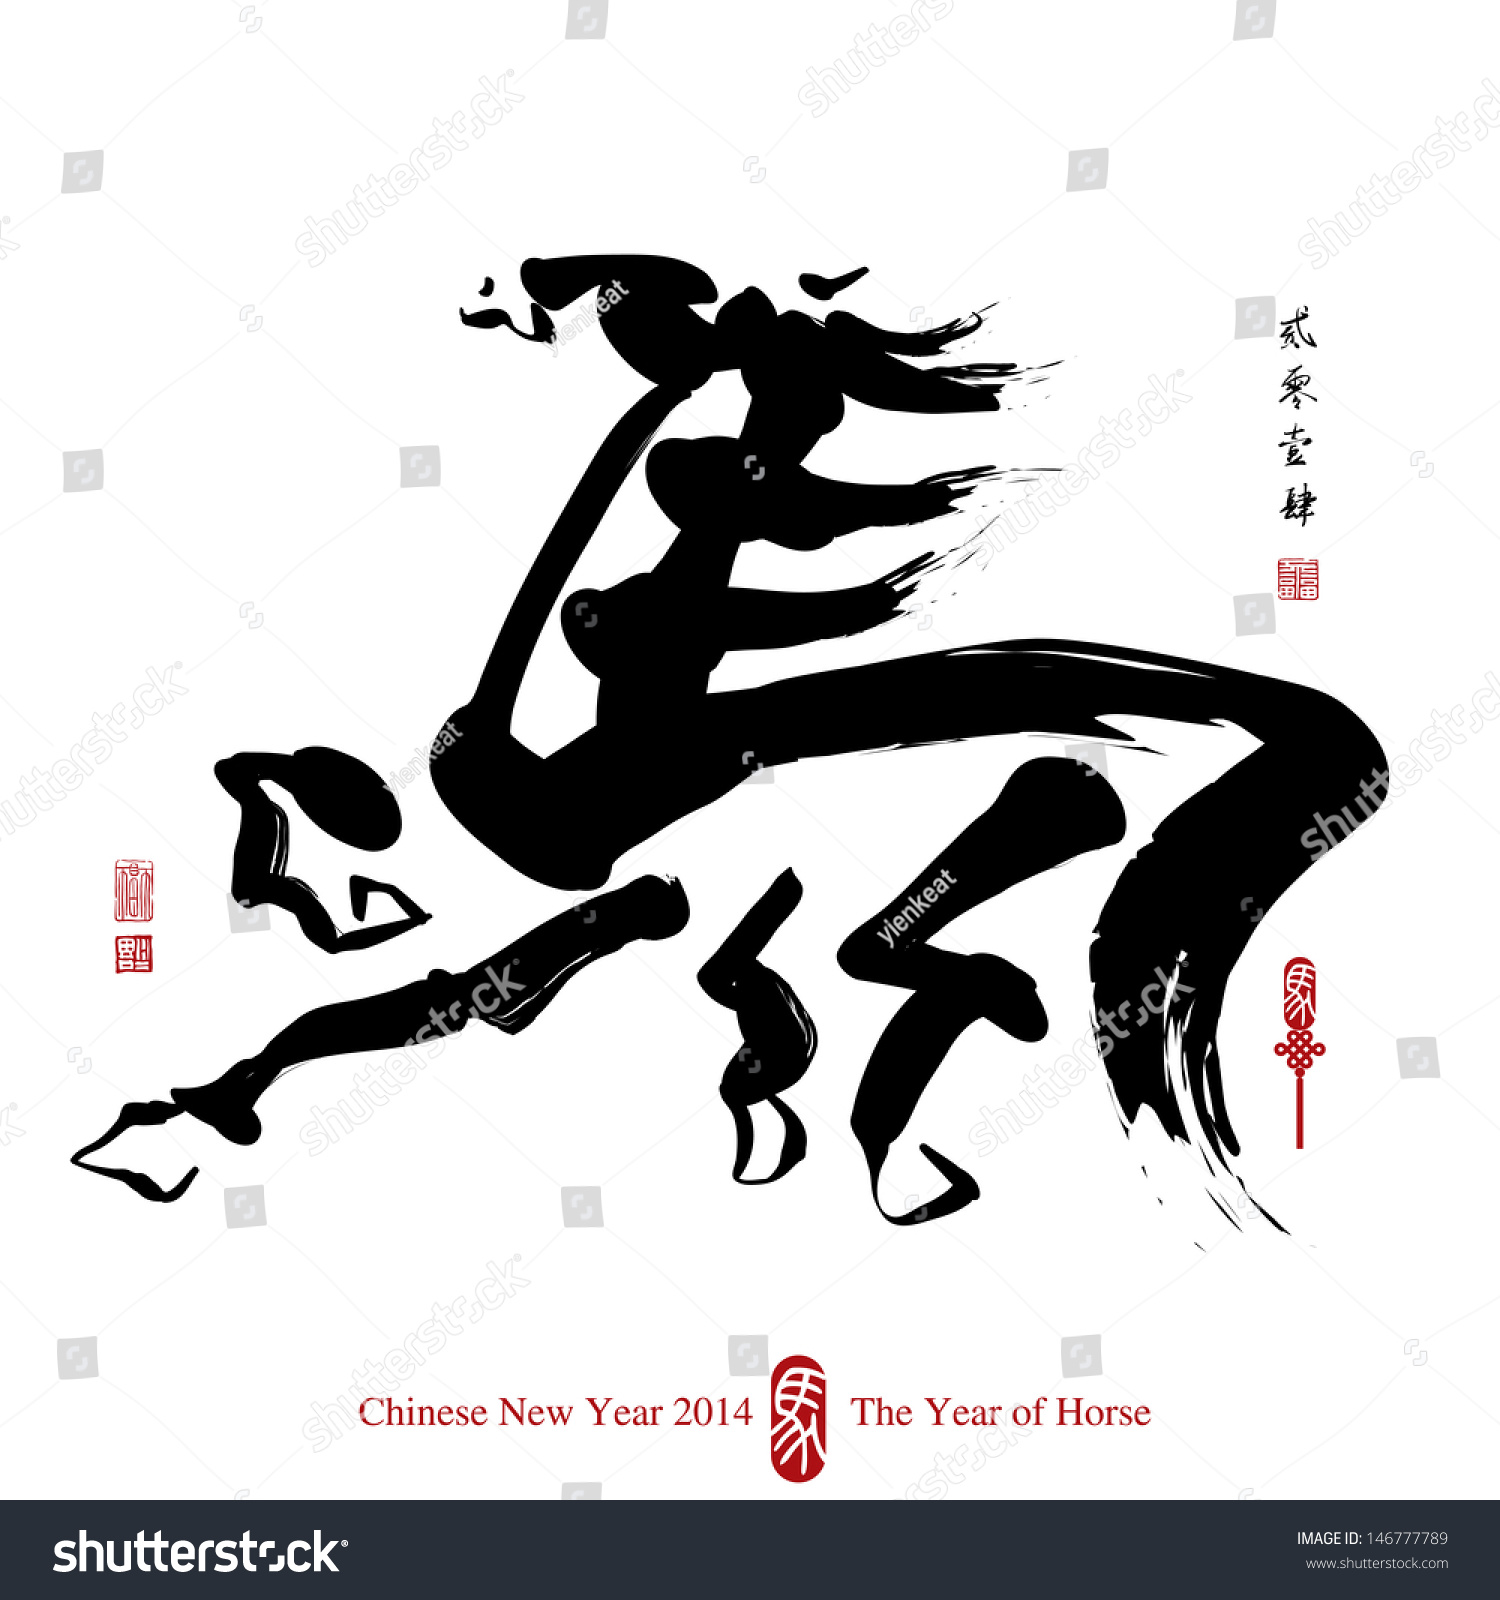 Horse Calligraphy Chinese New Year 2014 Translation